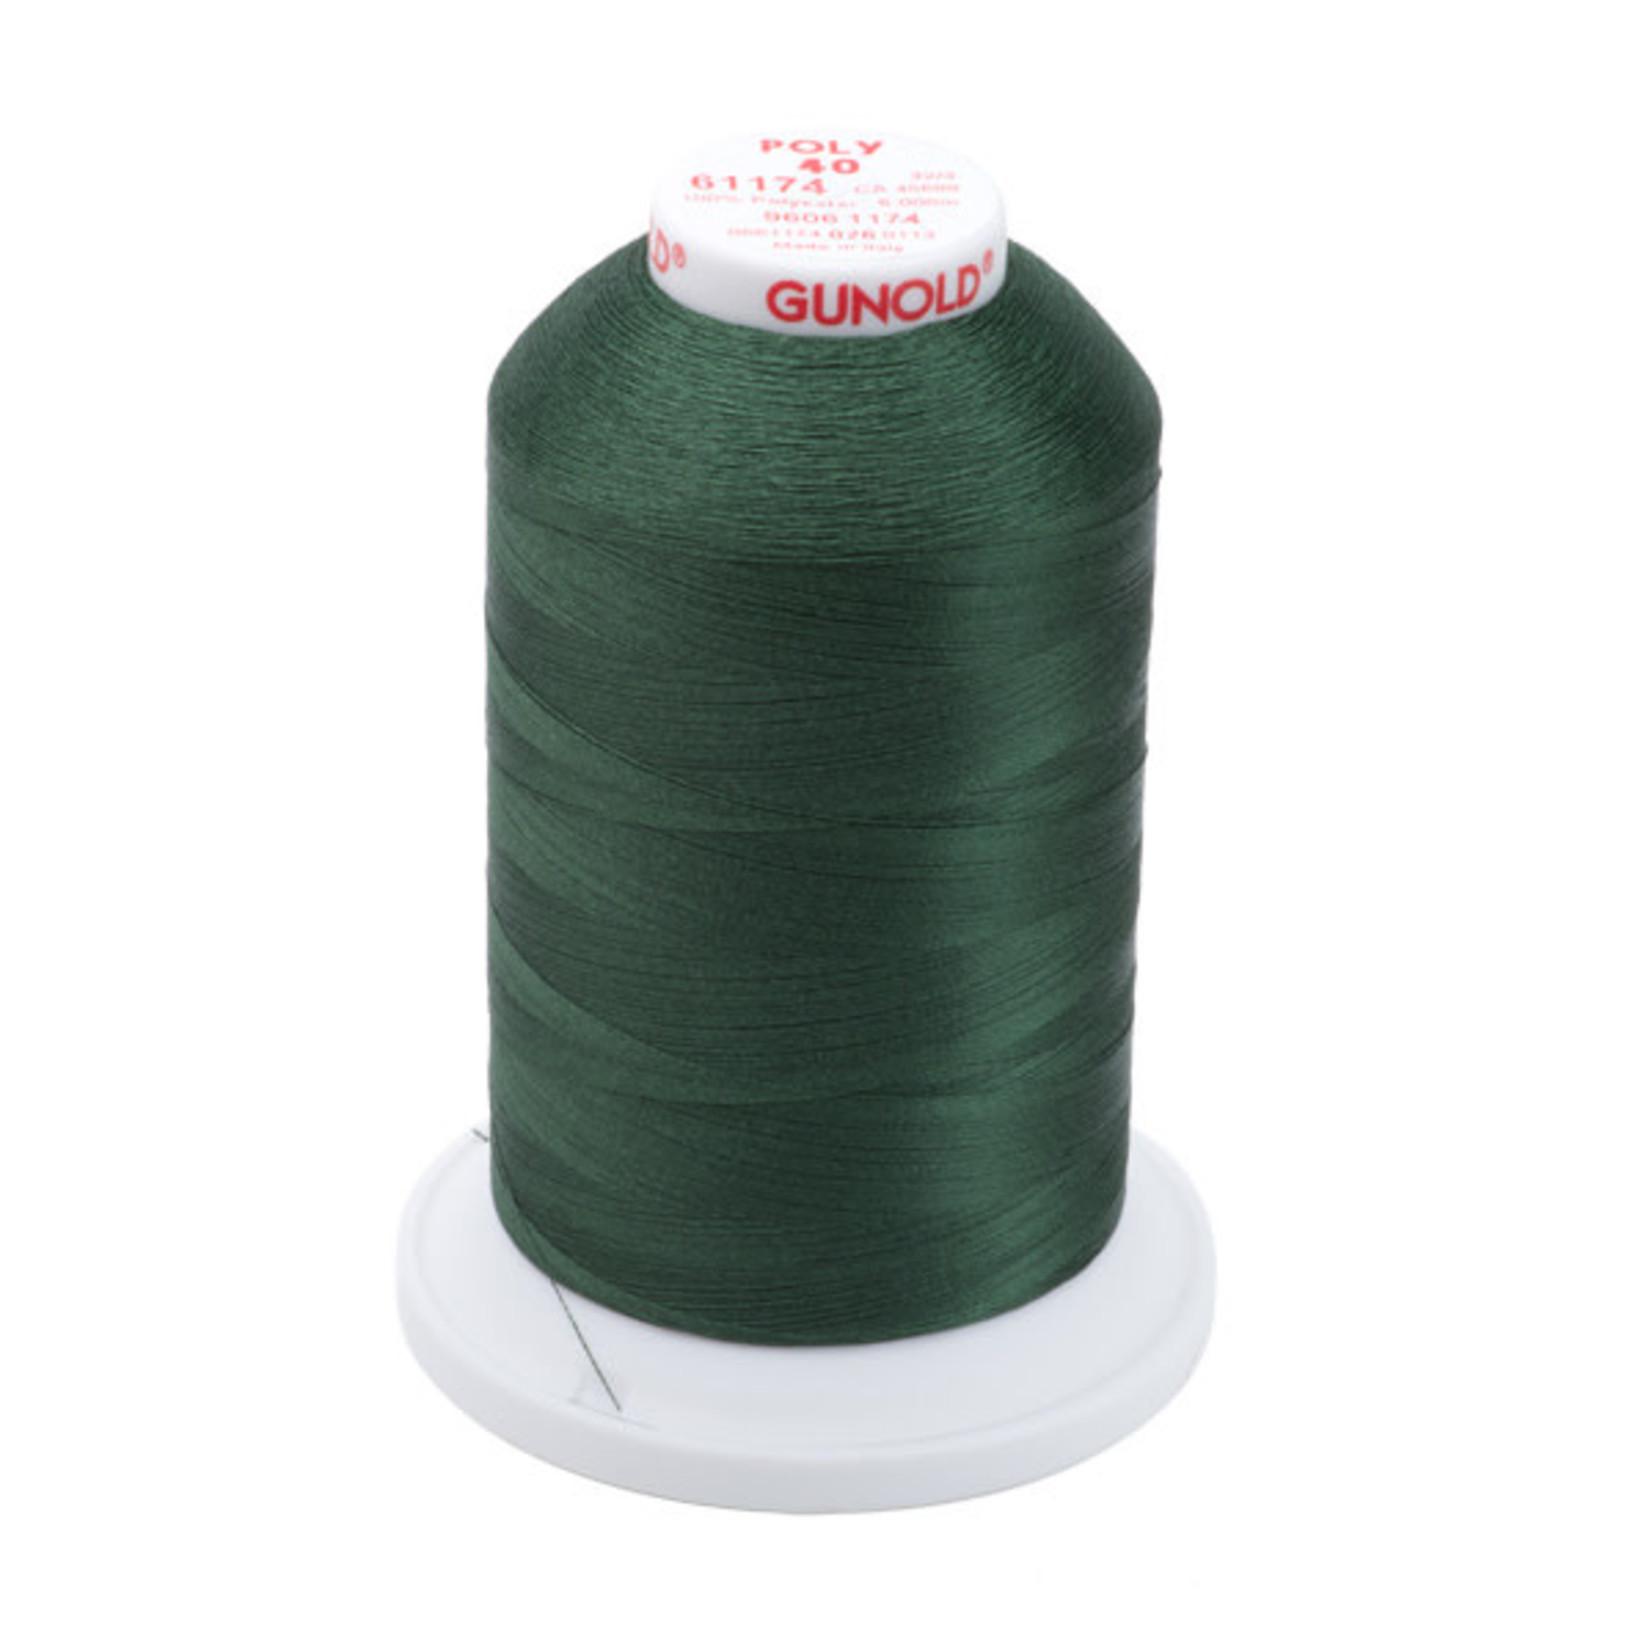 Gunold Poly 40 WT 61174 Dark Pine Green 1000m